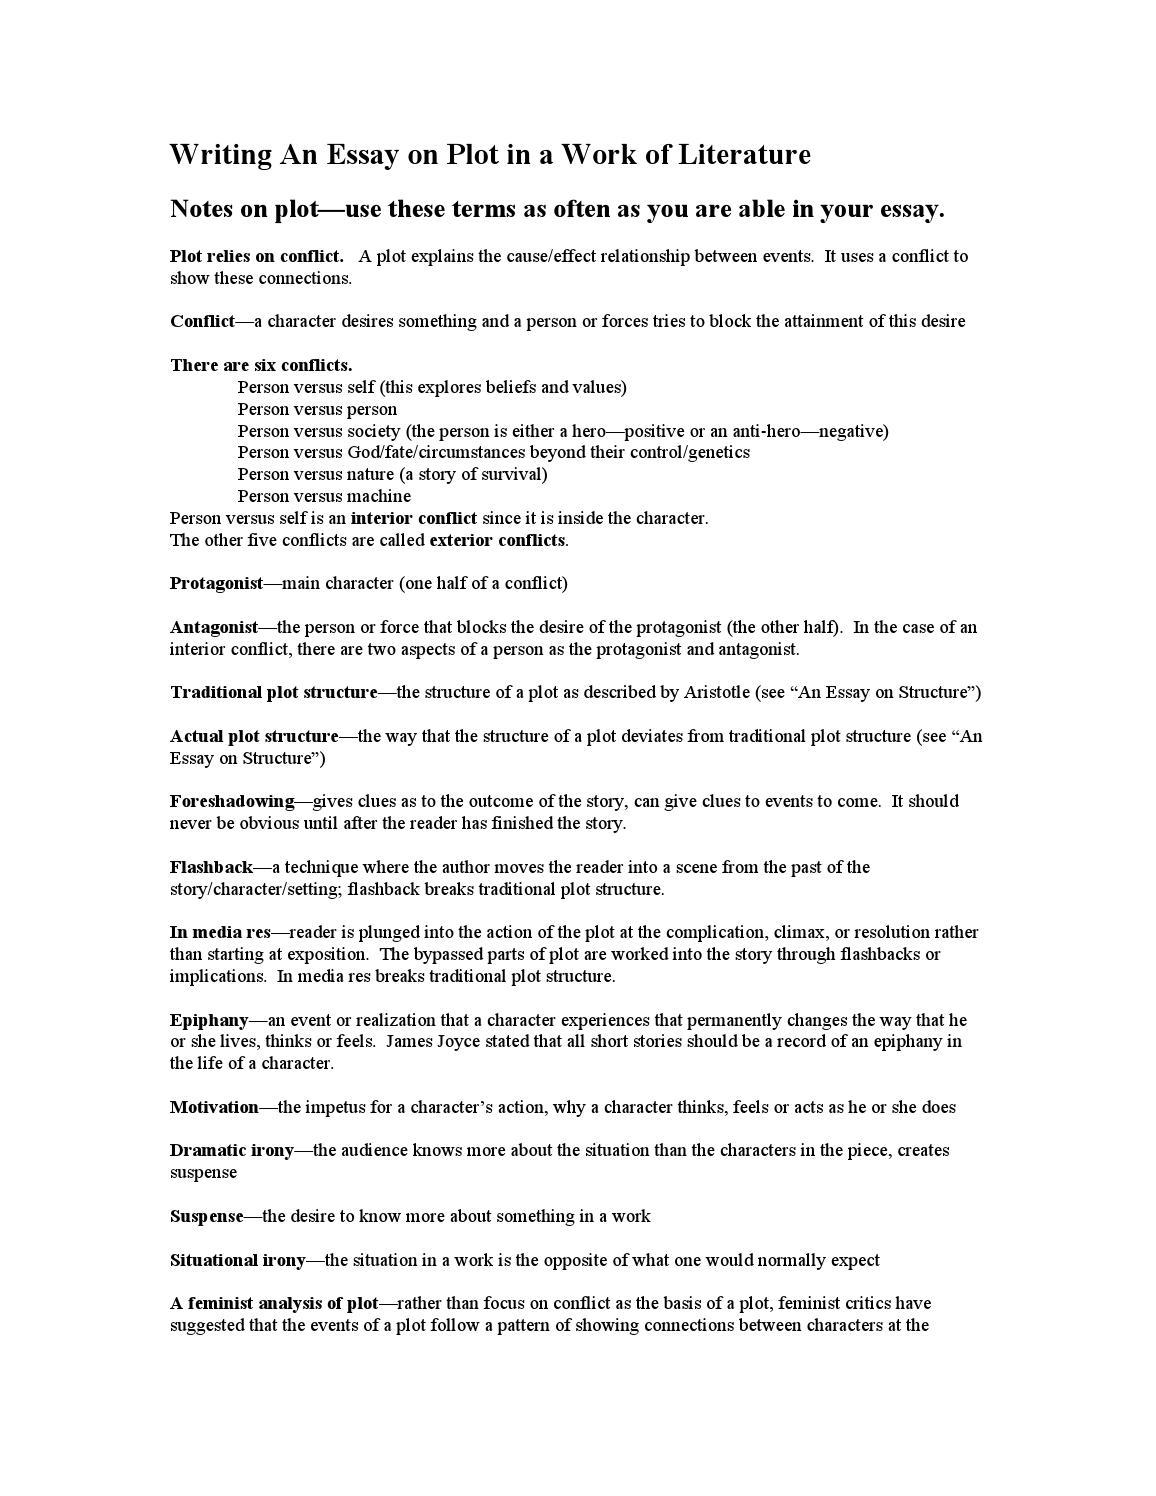 Essay Writer Uk  Essay Plagiarism also Describe Yourself Essay Plot Essay By Azliza Ali  Issuu Essay About Teamwork